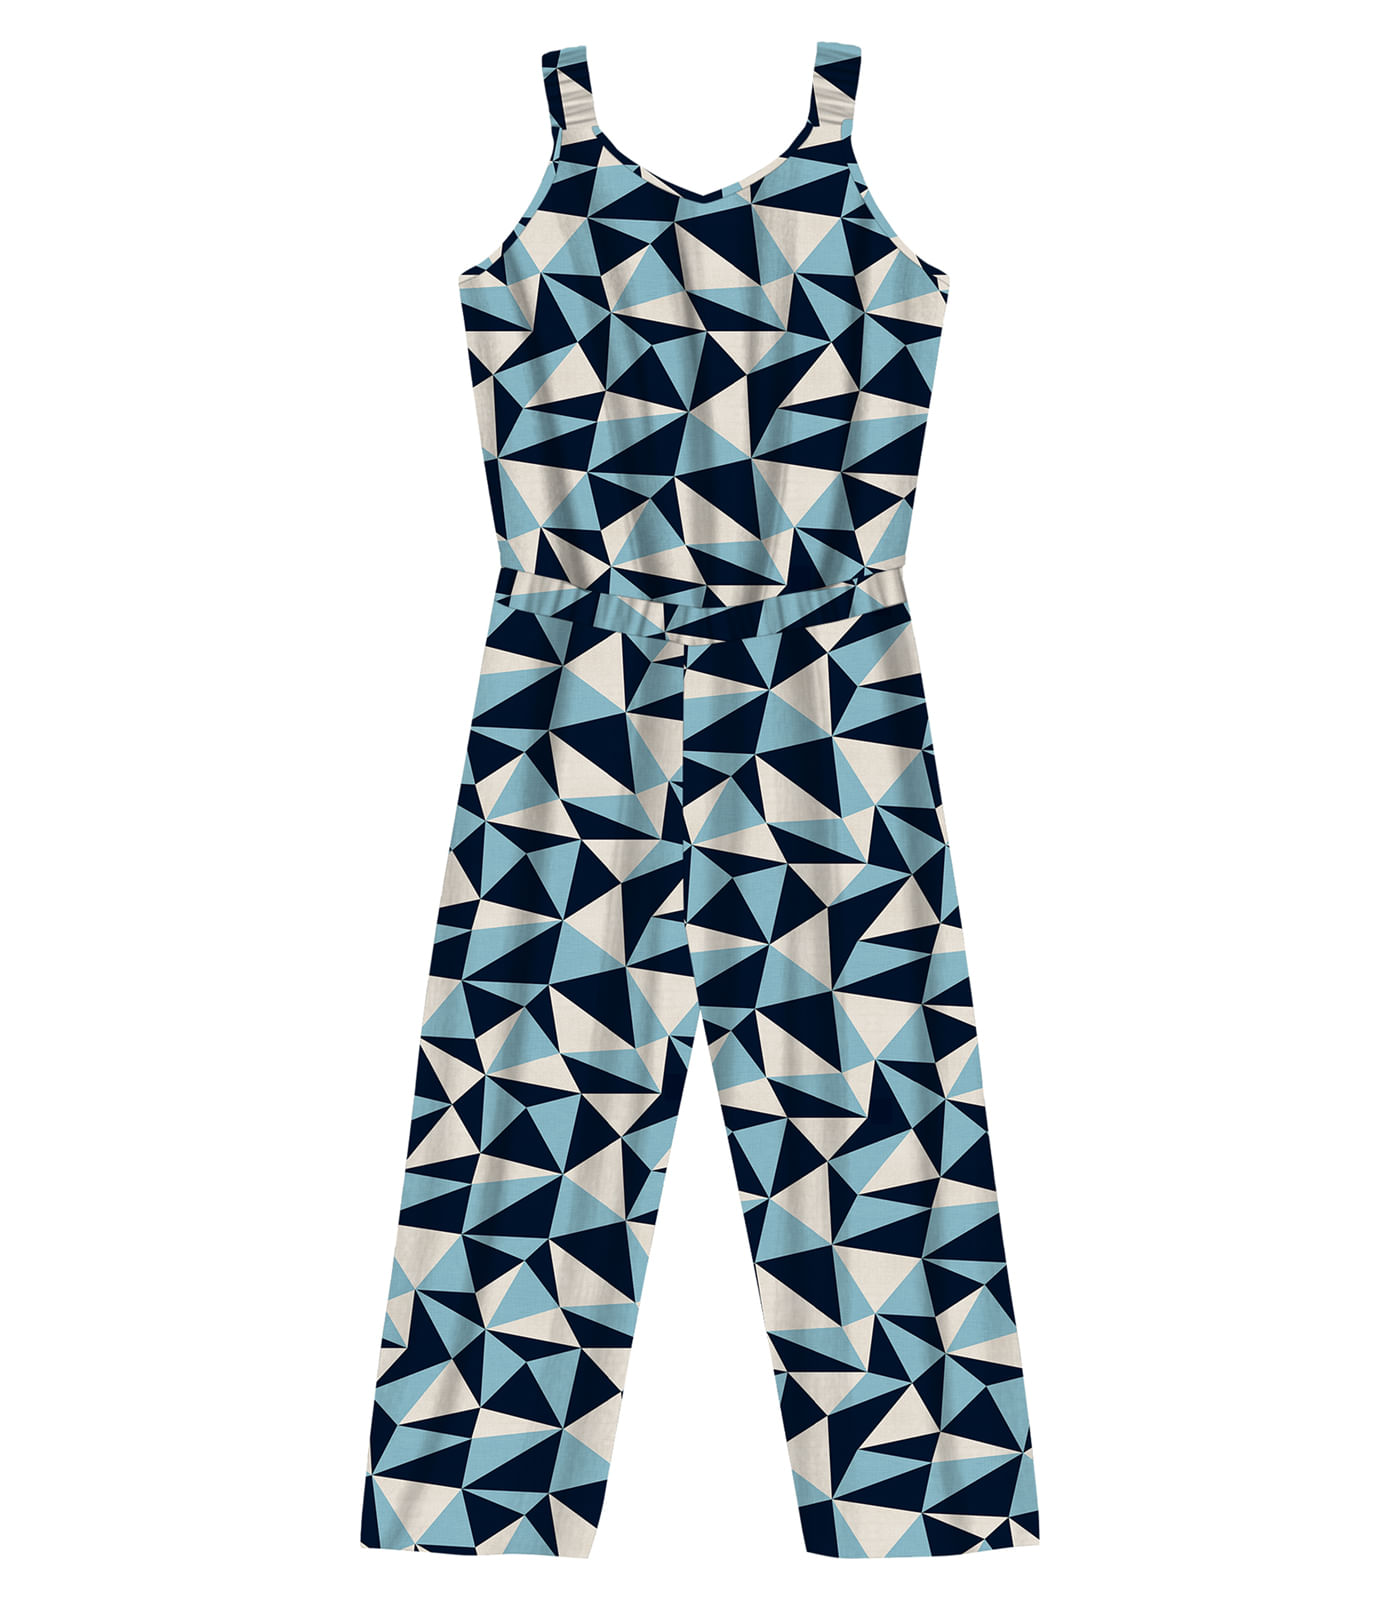 Macacao-Feminino-Plus-Size-Geometrico-Secret-Glam-Azul